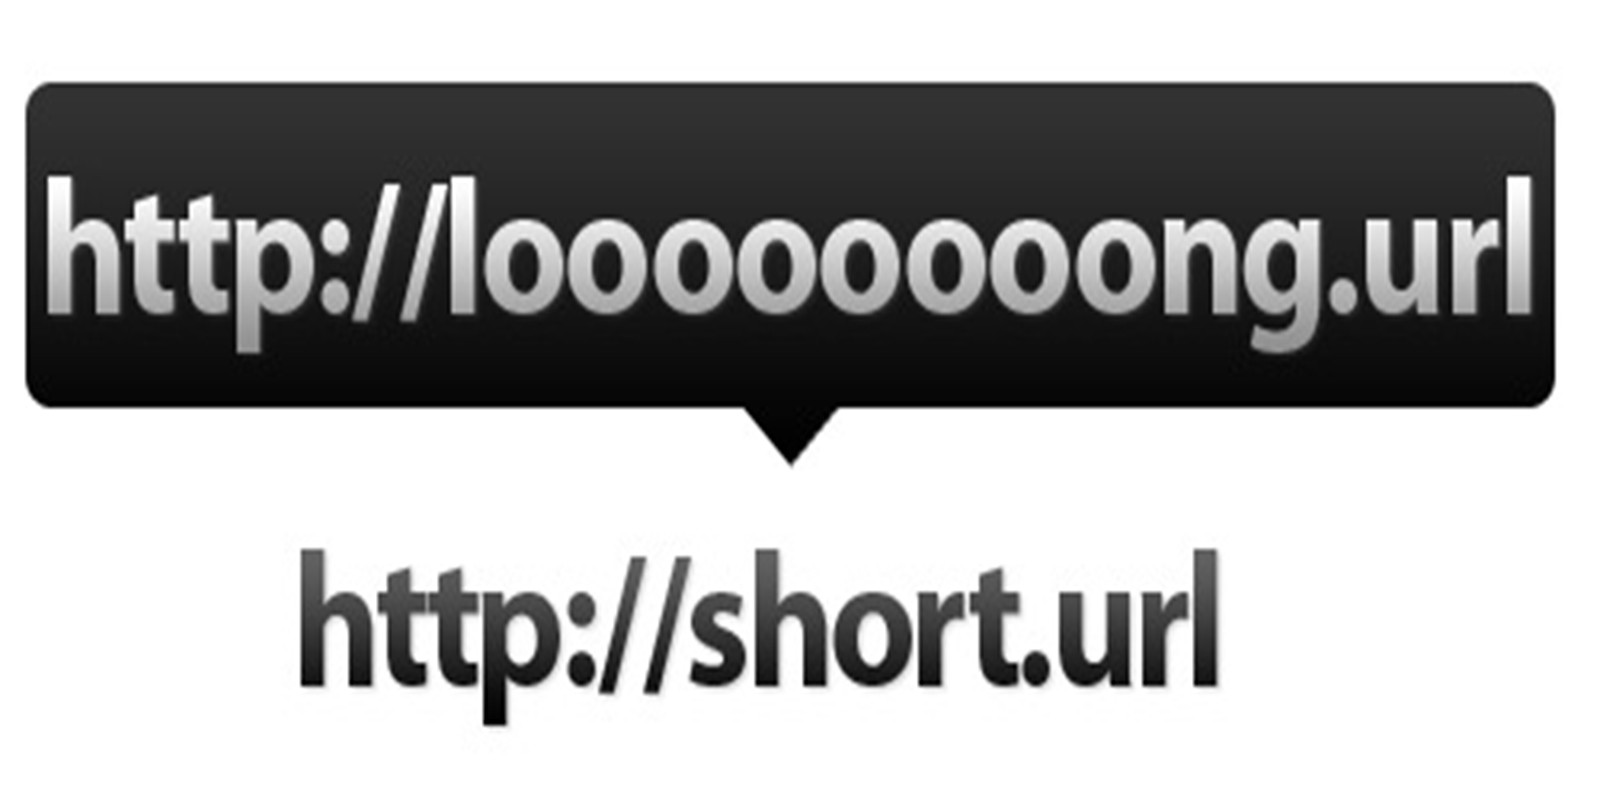 URL Shortener Without Database PHP Script